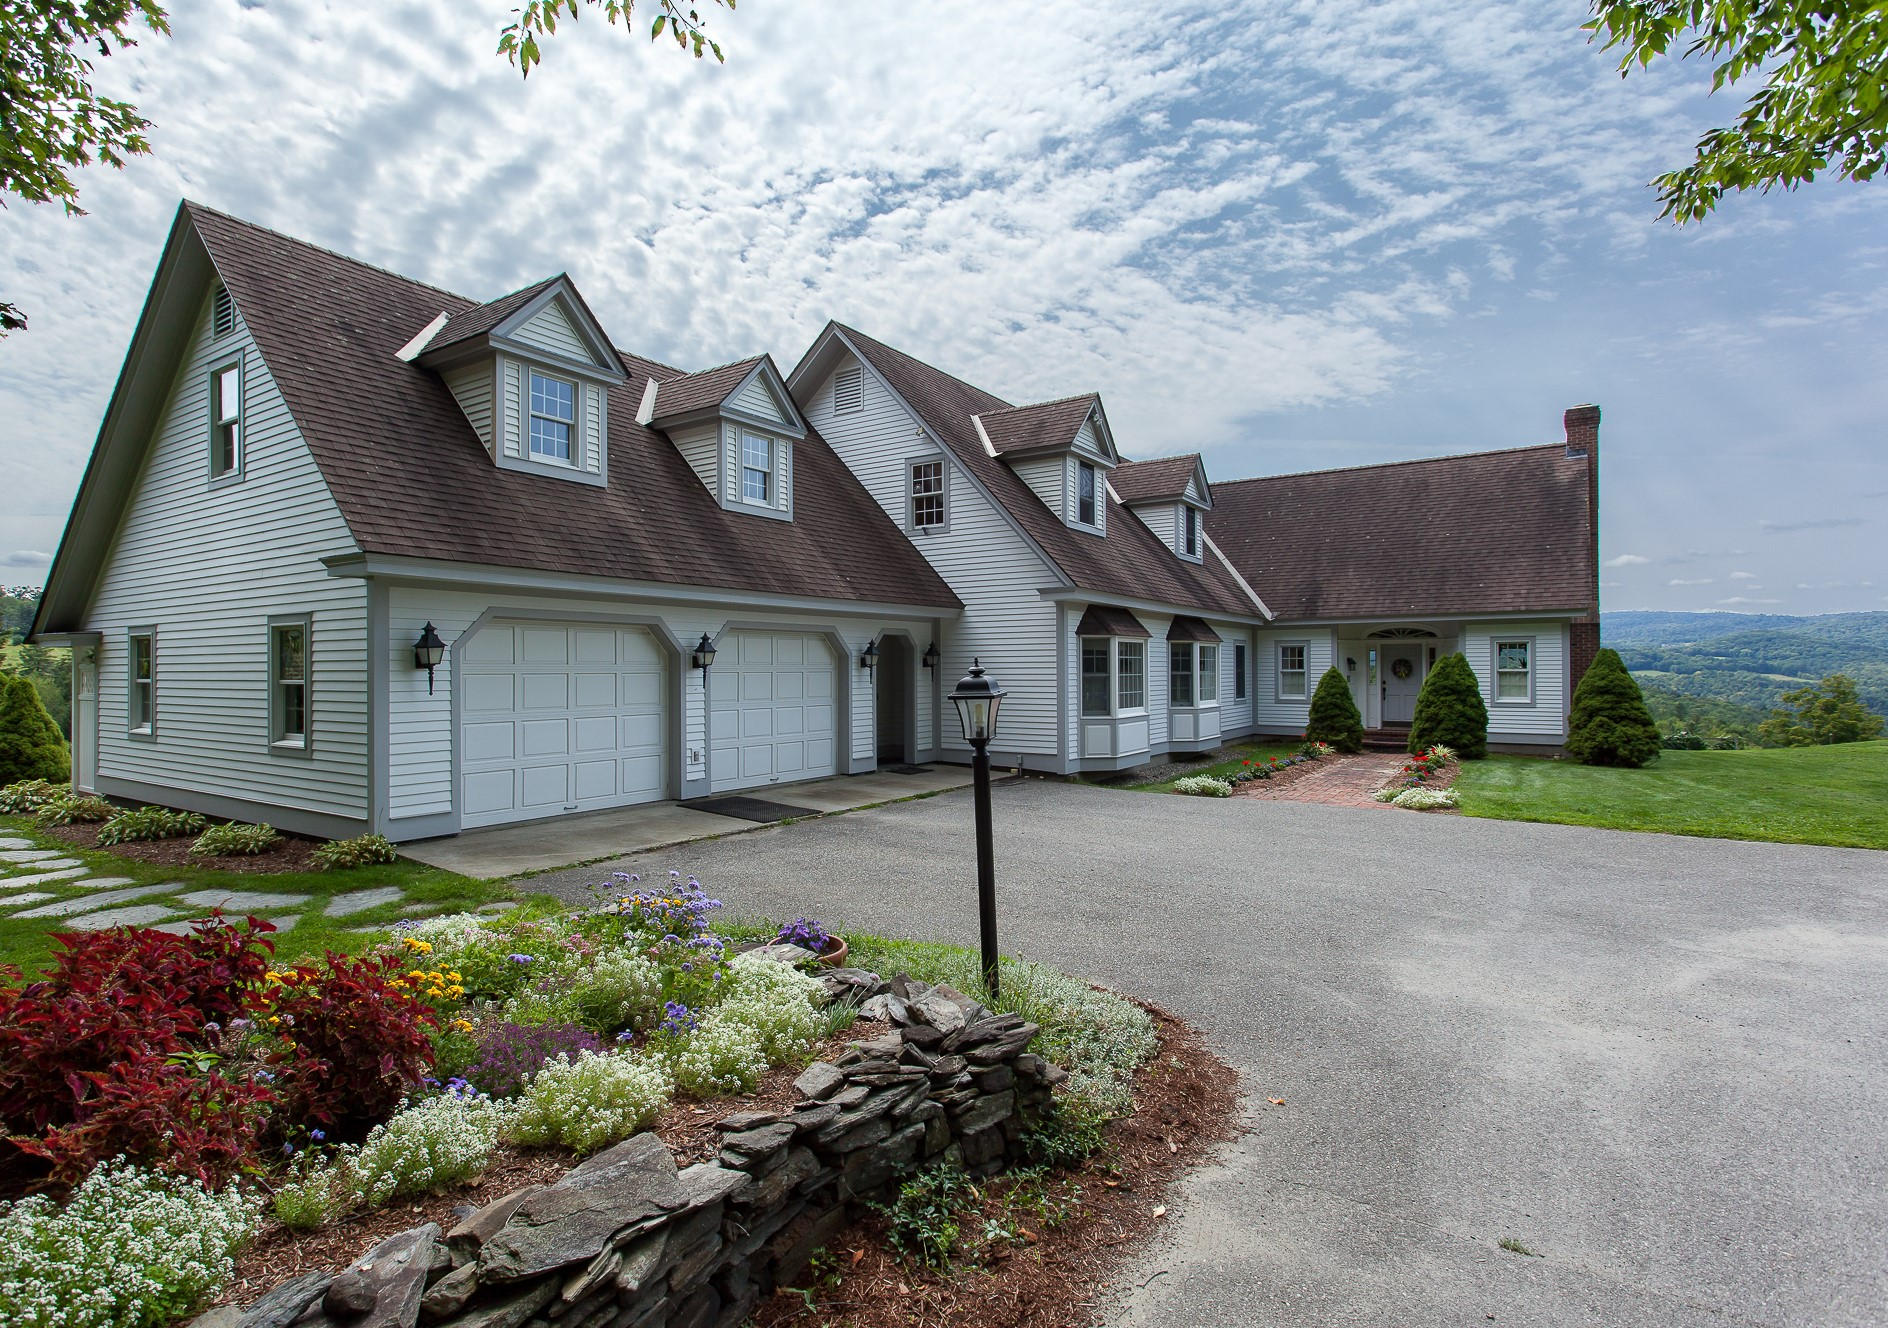 Luxury Upper Valley Home